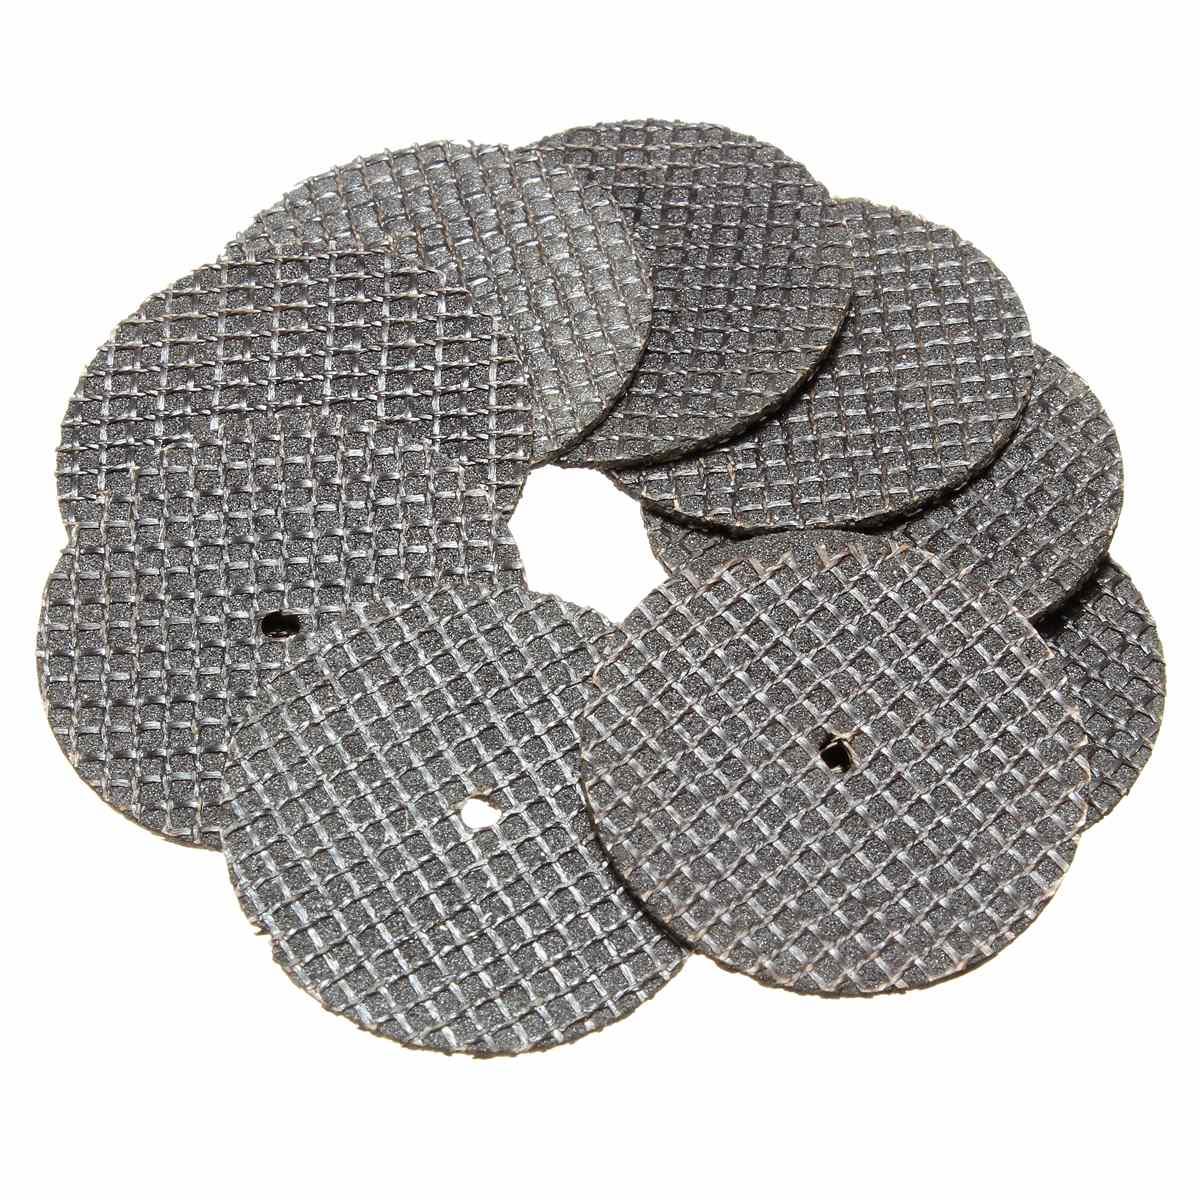 20Pcs 32mm Resin Fiber Metal Cutting Disc Circular Saw Blade Dremel Wheel Cutting Sanding Disc For Dremel Grinder Rotary Tools